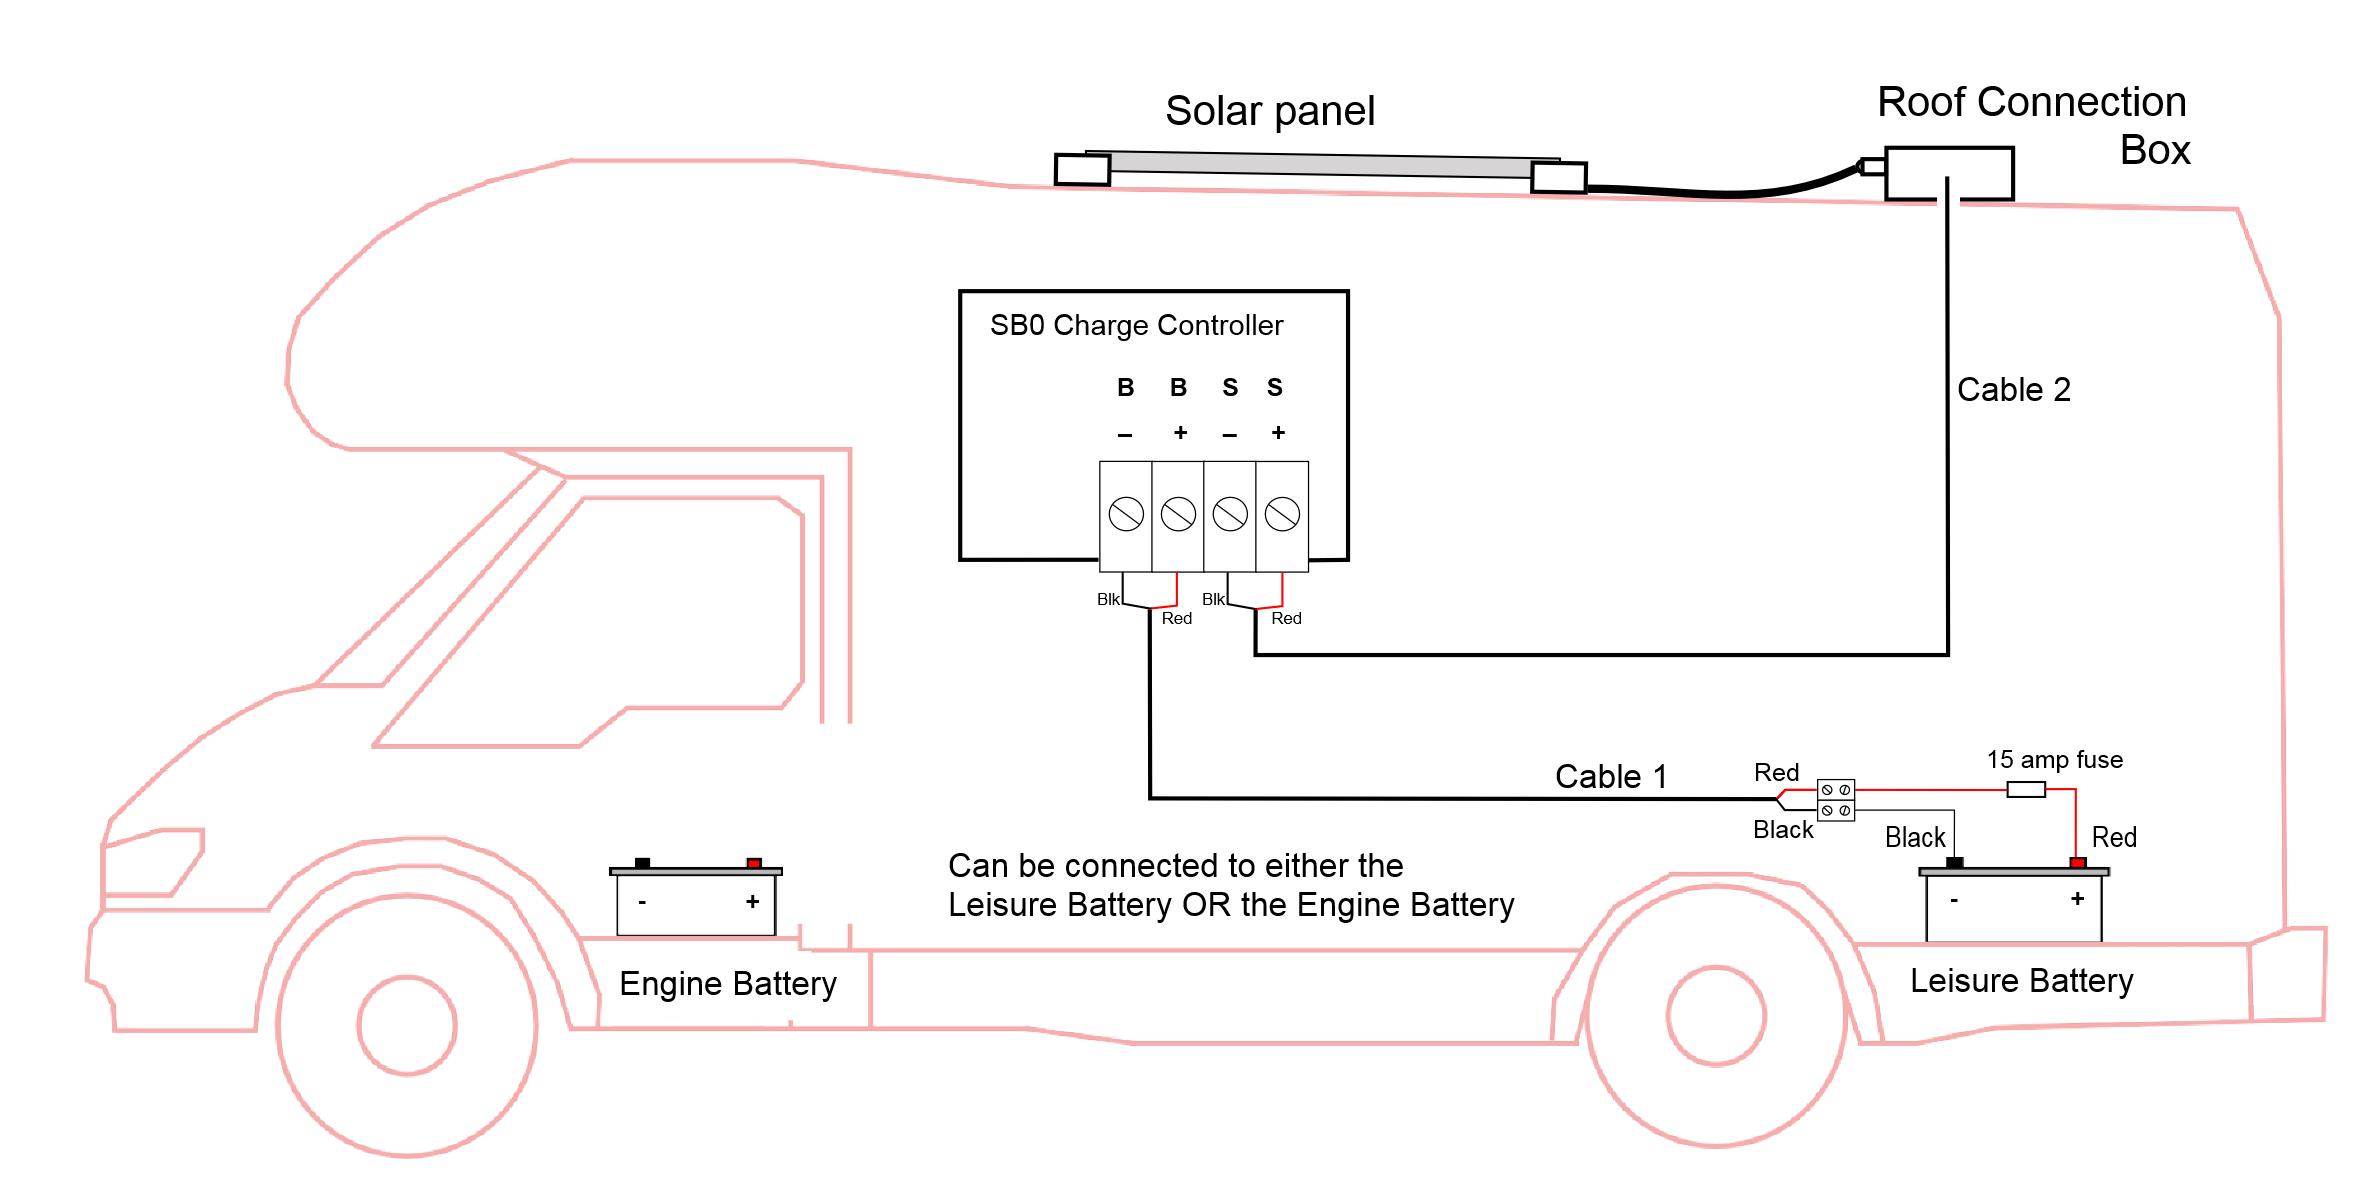 Solar Panel System Semi Flexible Or Rigid Motorhomes Boats Or Caravans